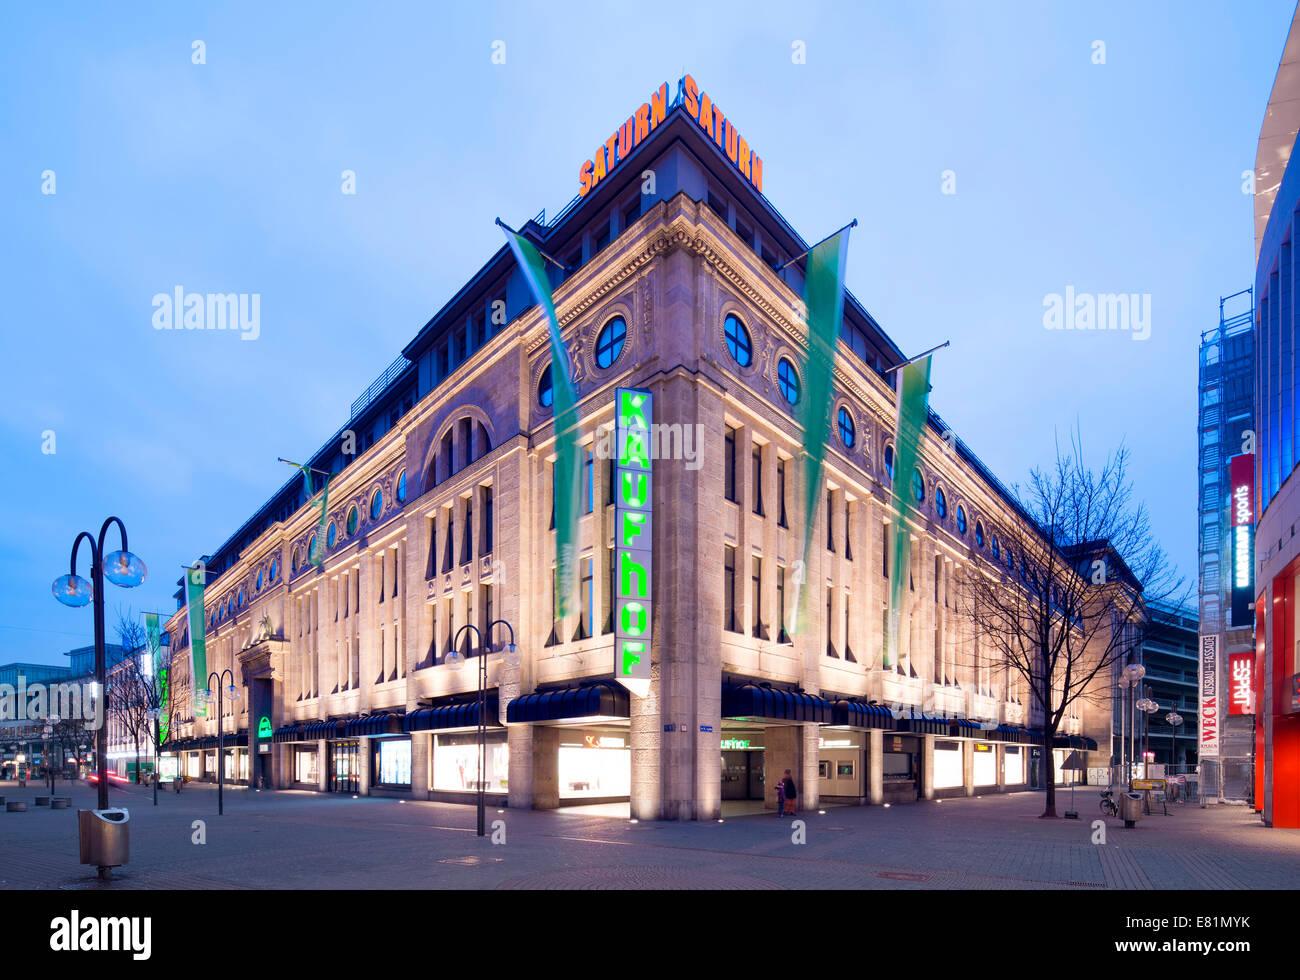 Galeria Kaufhof department store, the former Leonhard Tietz department store, Cologne, North Rhine-Westphalia, Germany - Stock Image